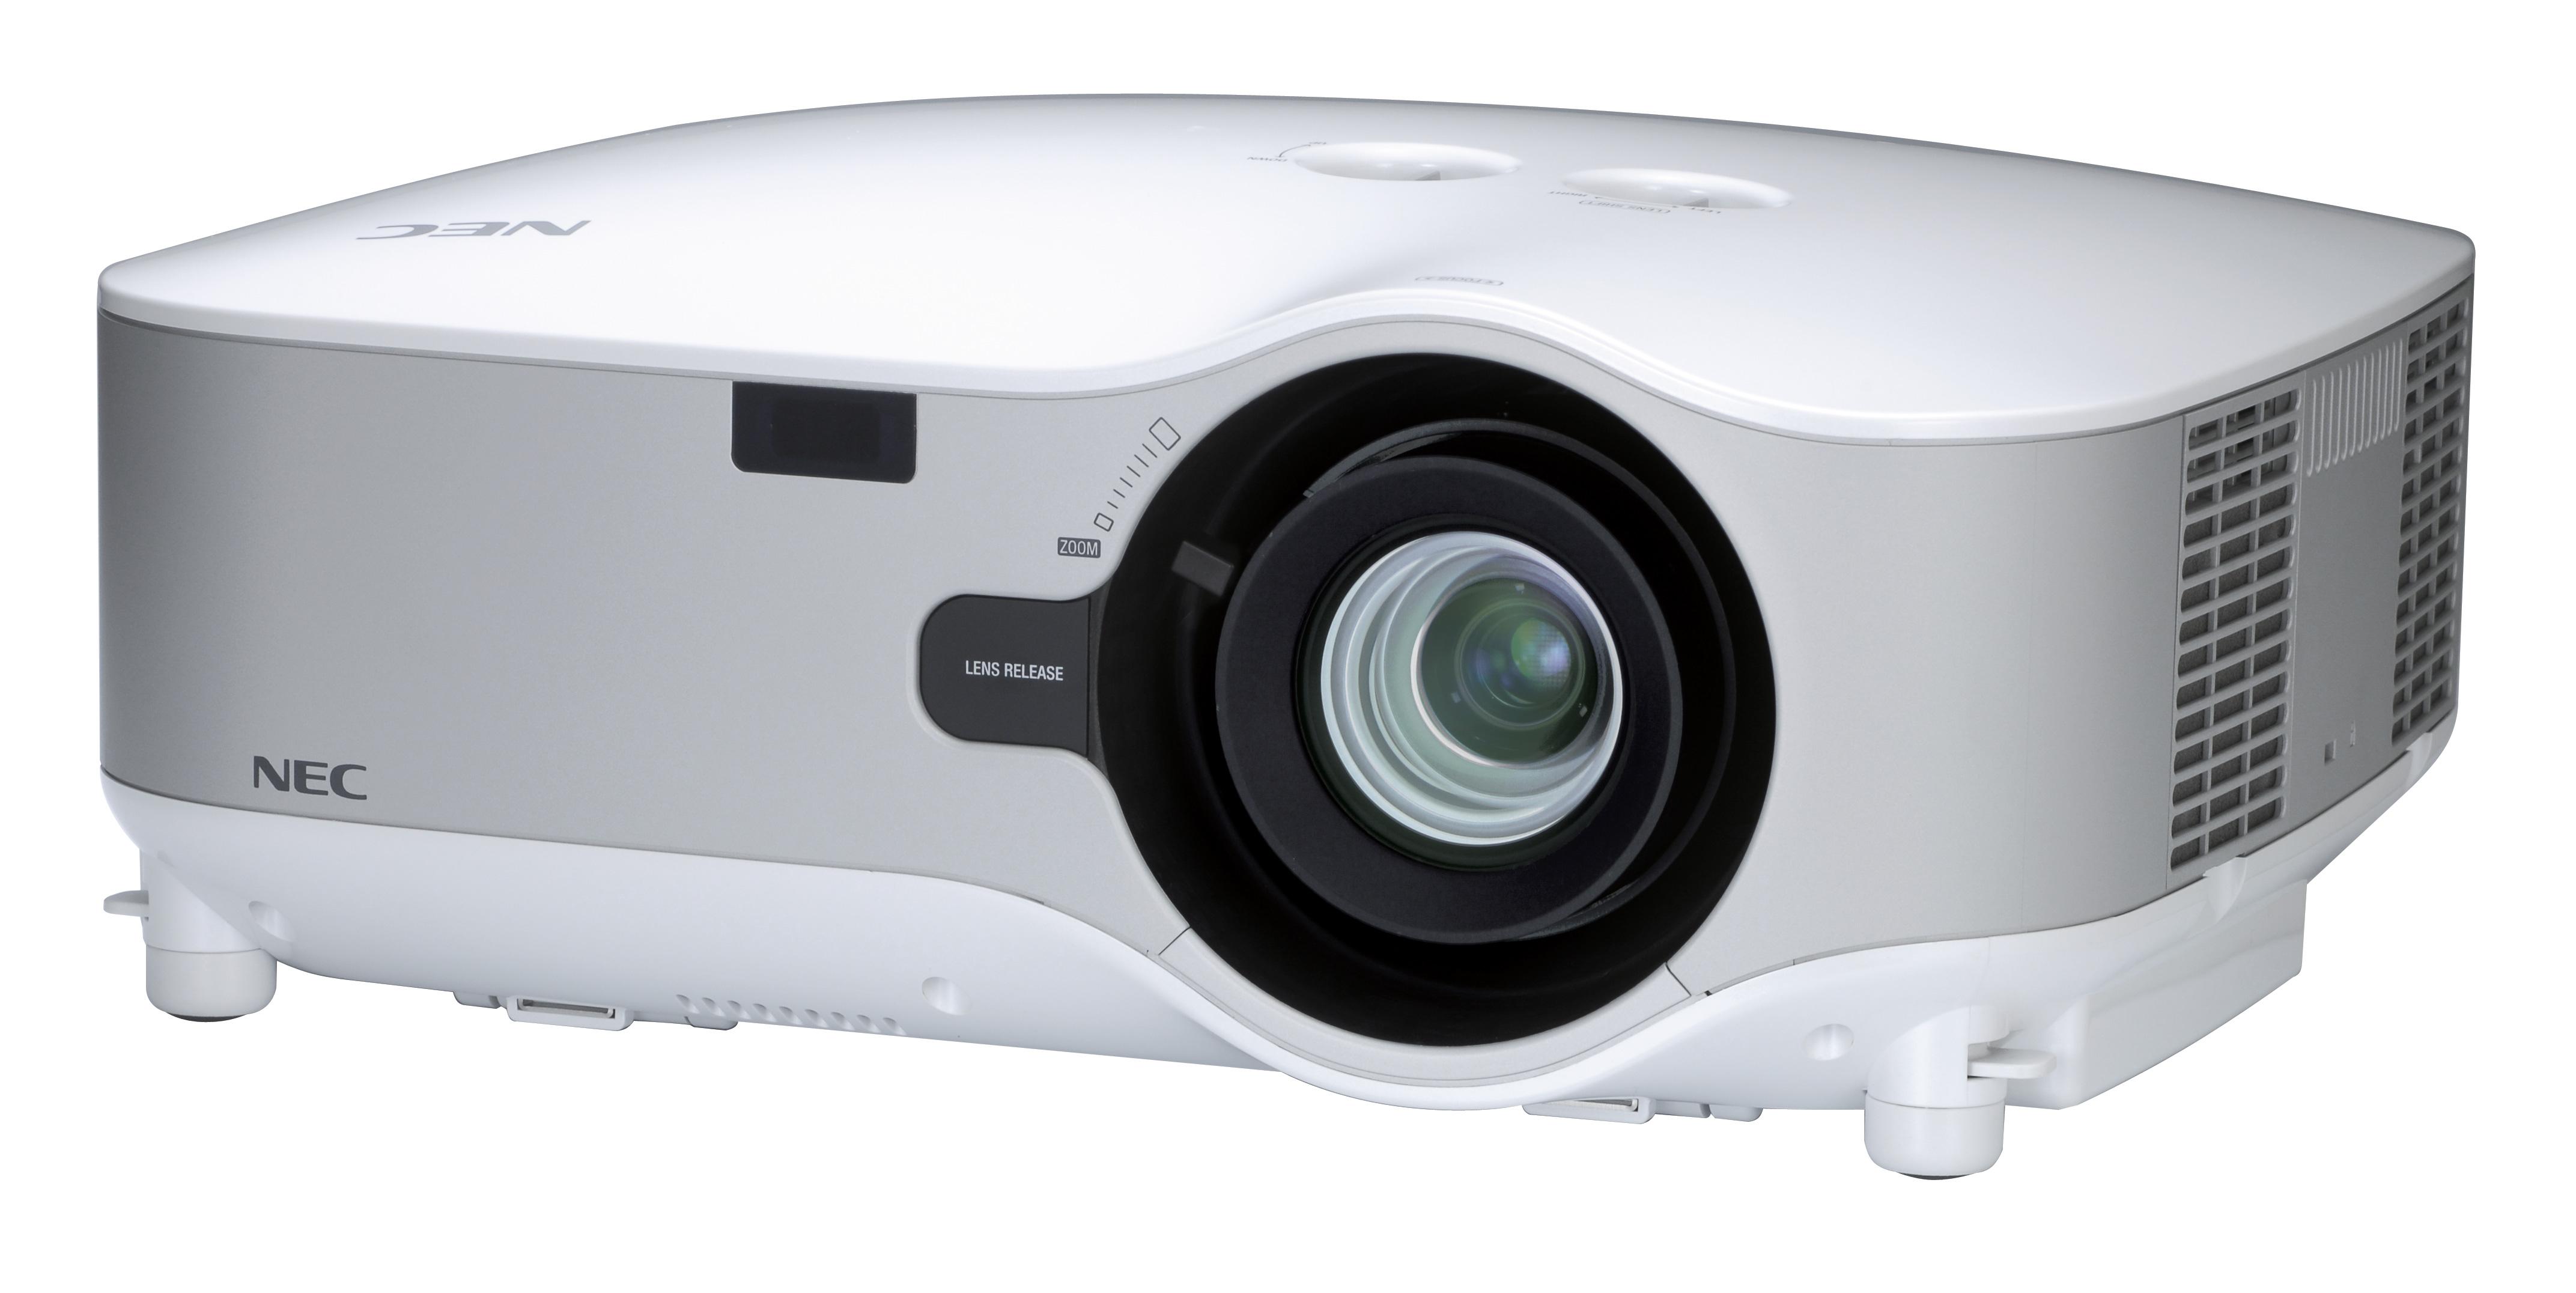 Nec Projektoren: Nec NP2000 XGA LCD Beamer